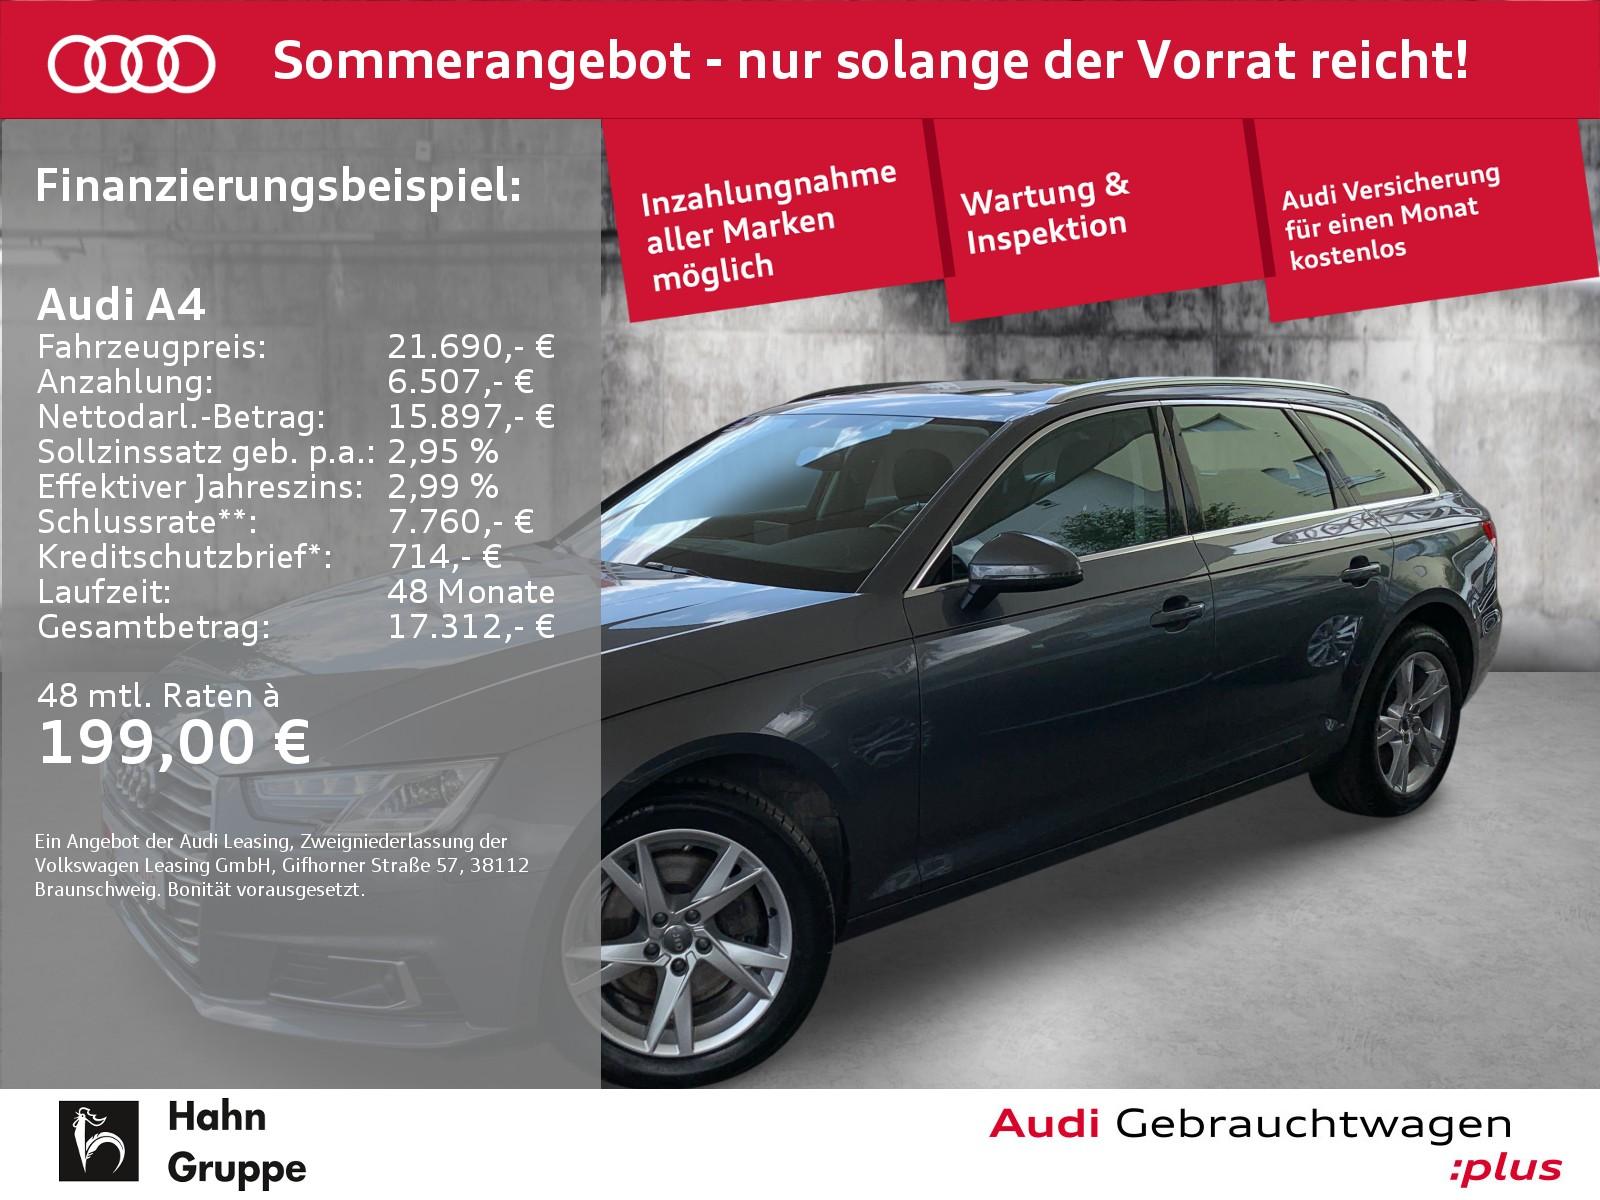 Audi A4 Avant 2.0 TDI S-trc Navi Xen ACC Pano Sitzh, Jahr 2017, Diesel